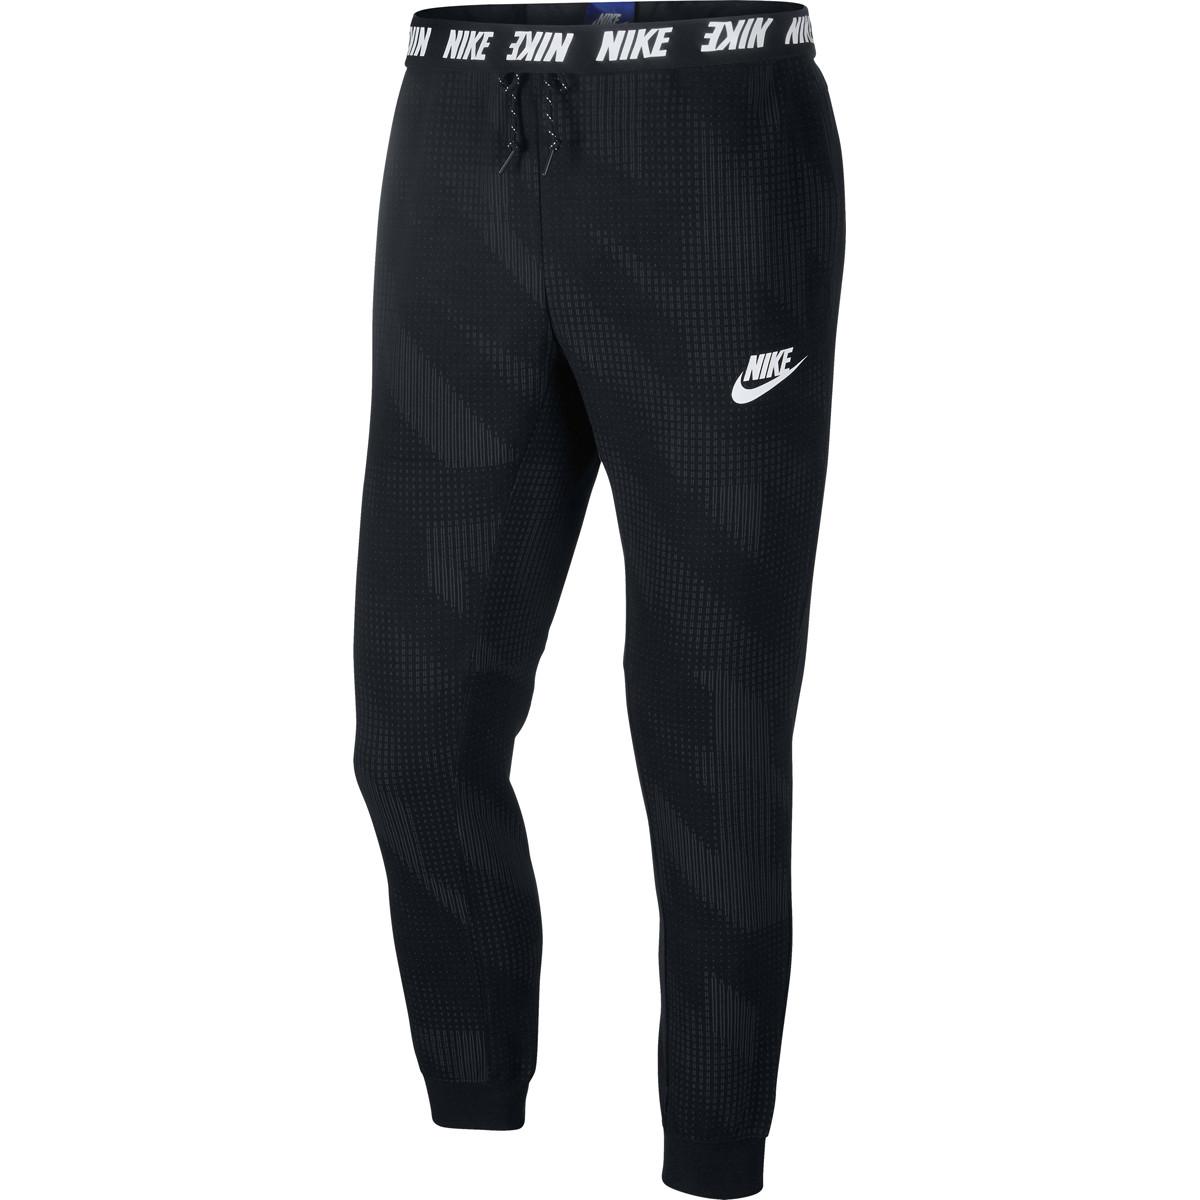 93069268 Штаны Nike M Nsw Av15 Pant Flc Aop 885939-010 (Оригинал), цена 1 439 ...